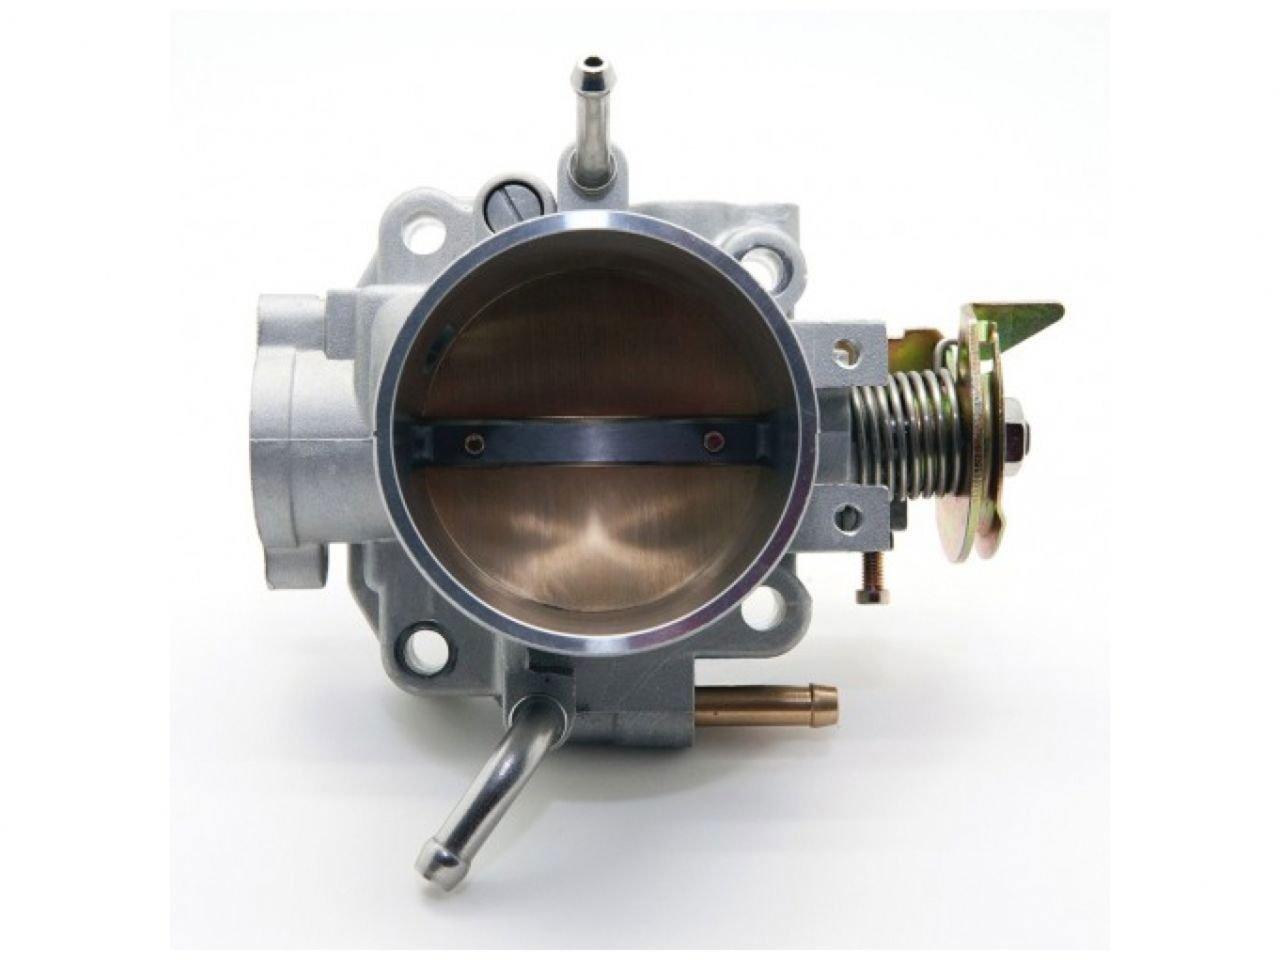 Blox Racing BXIM-00213 Cast Aluminum Throttle Body by Blox Racing